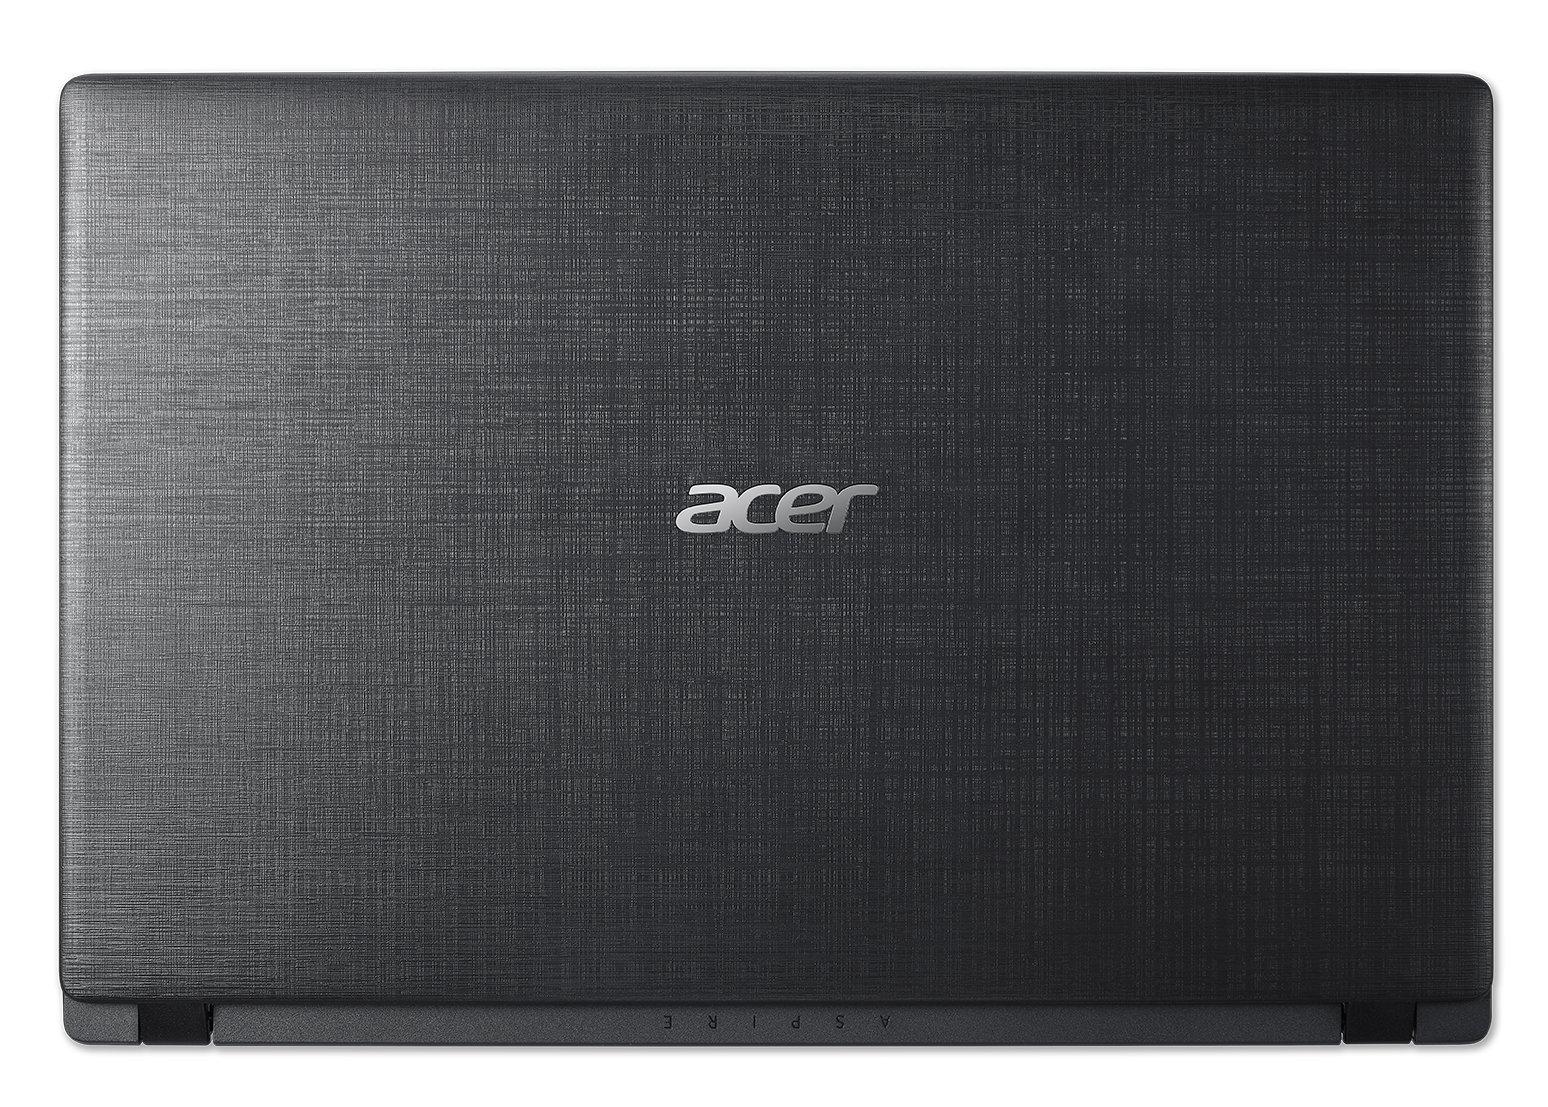 e1eddfedb264d2 Acer Aspire A315-21-97HC PC Portable 15,6″ Noir (AMD Dual-Core A9, 4 ...